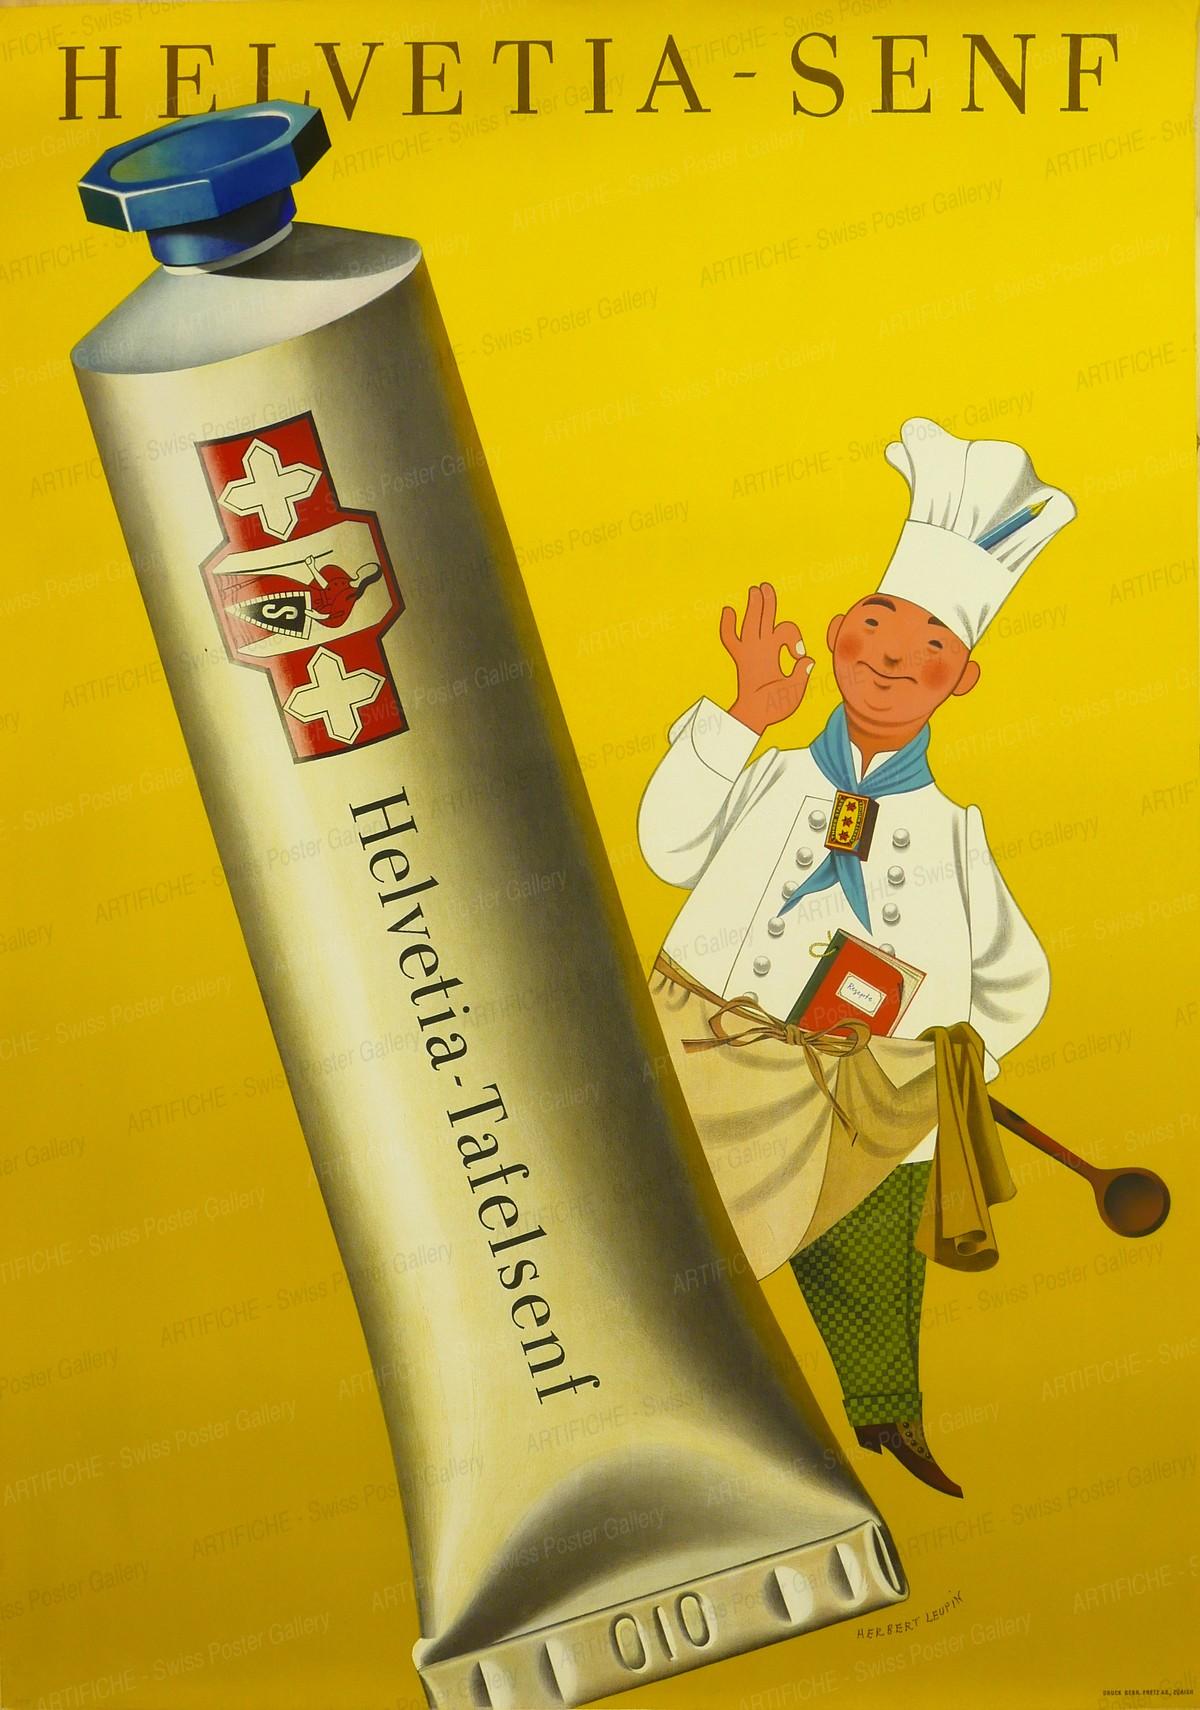 Helvetia-Senf, Herbert Leupin